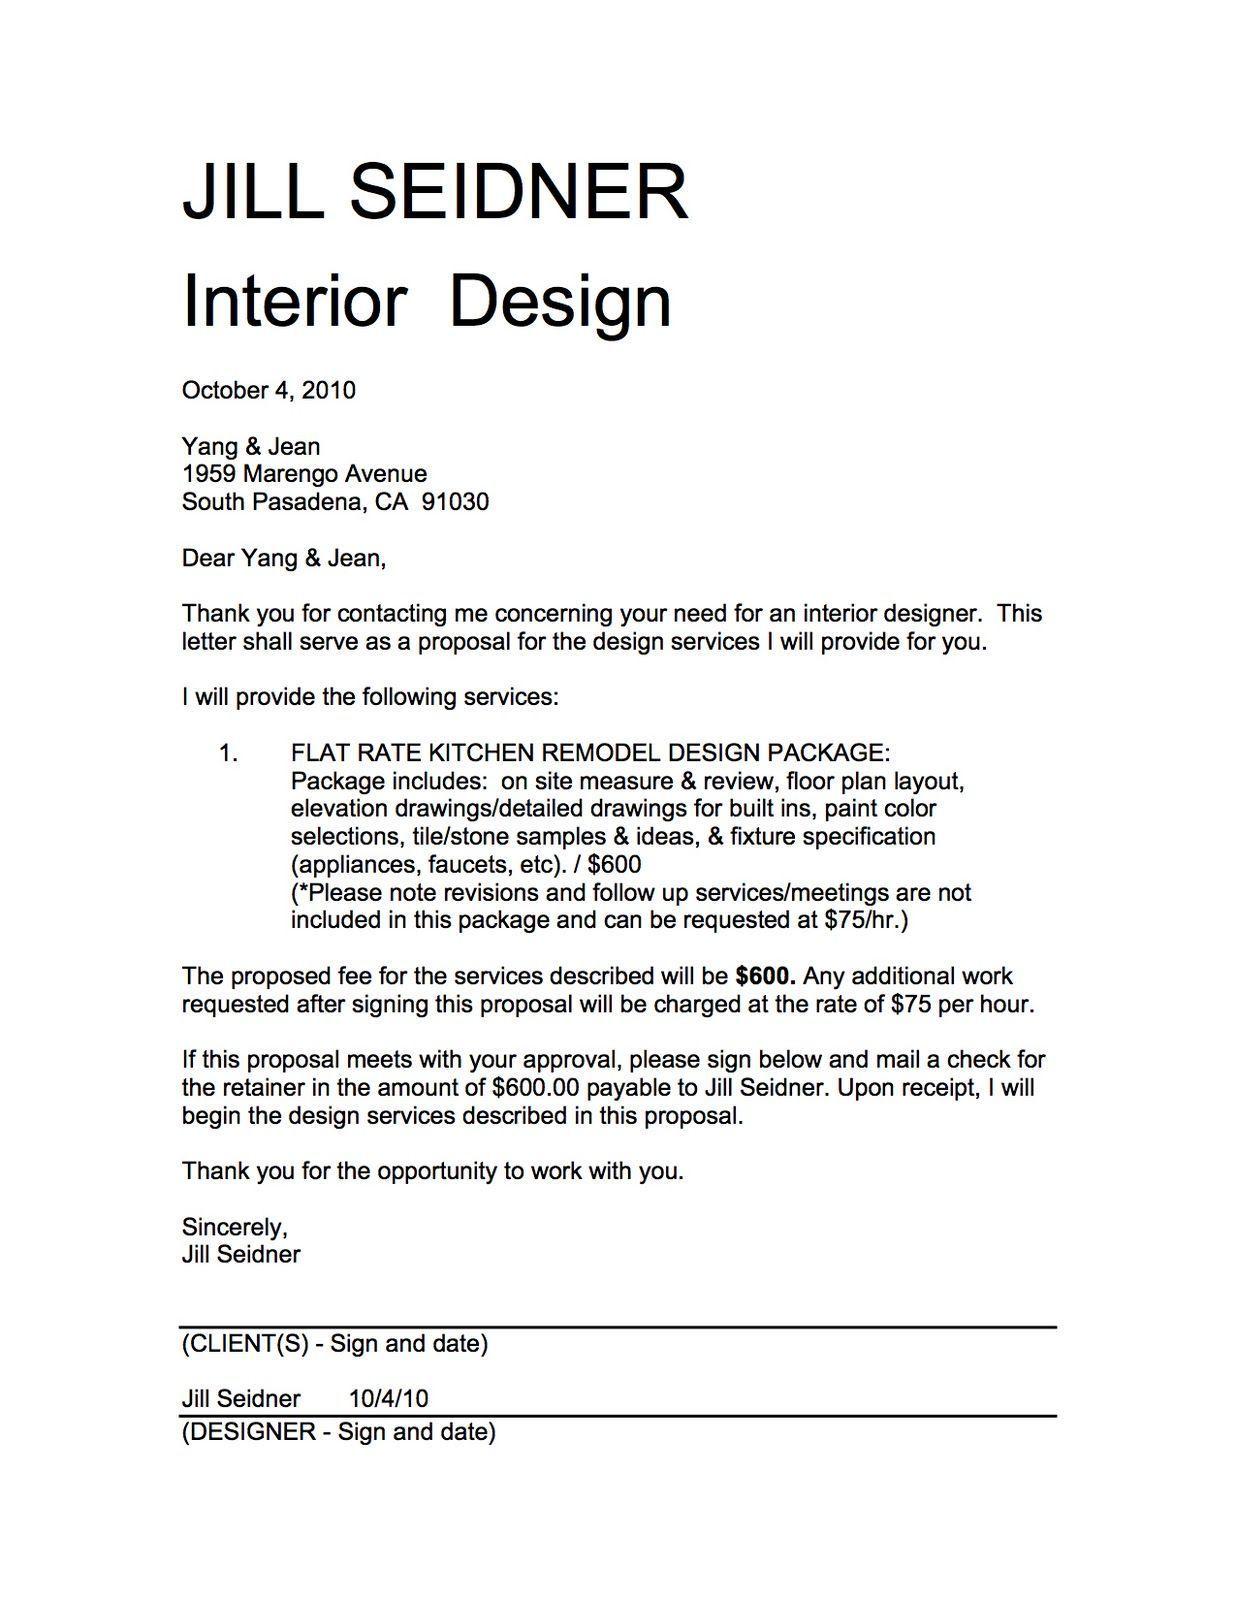 Wonderful interior design business plan new at furniture s - Interior decoration business plan ...